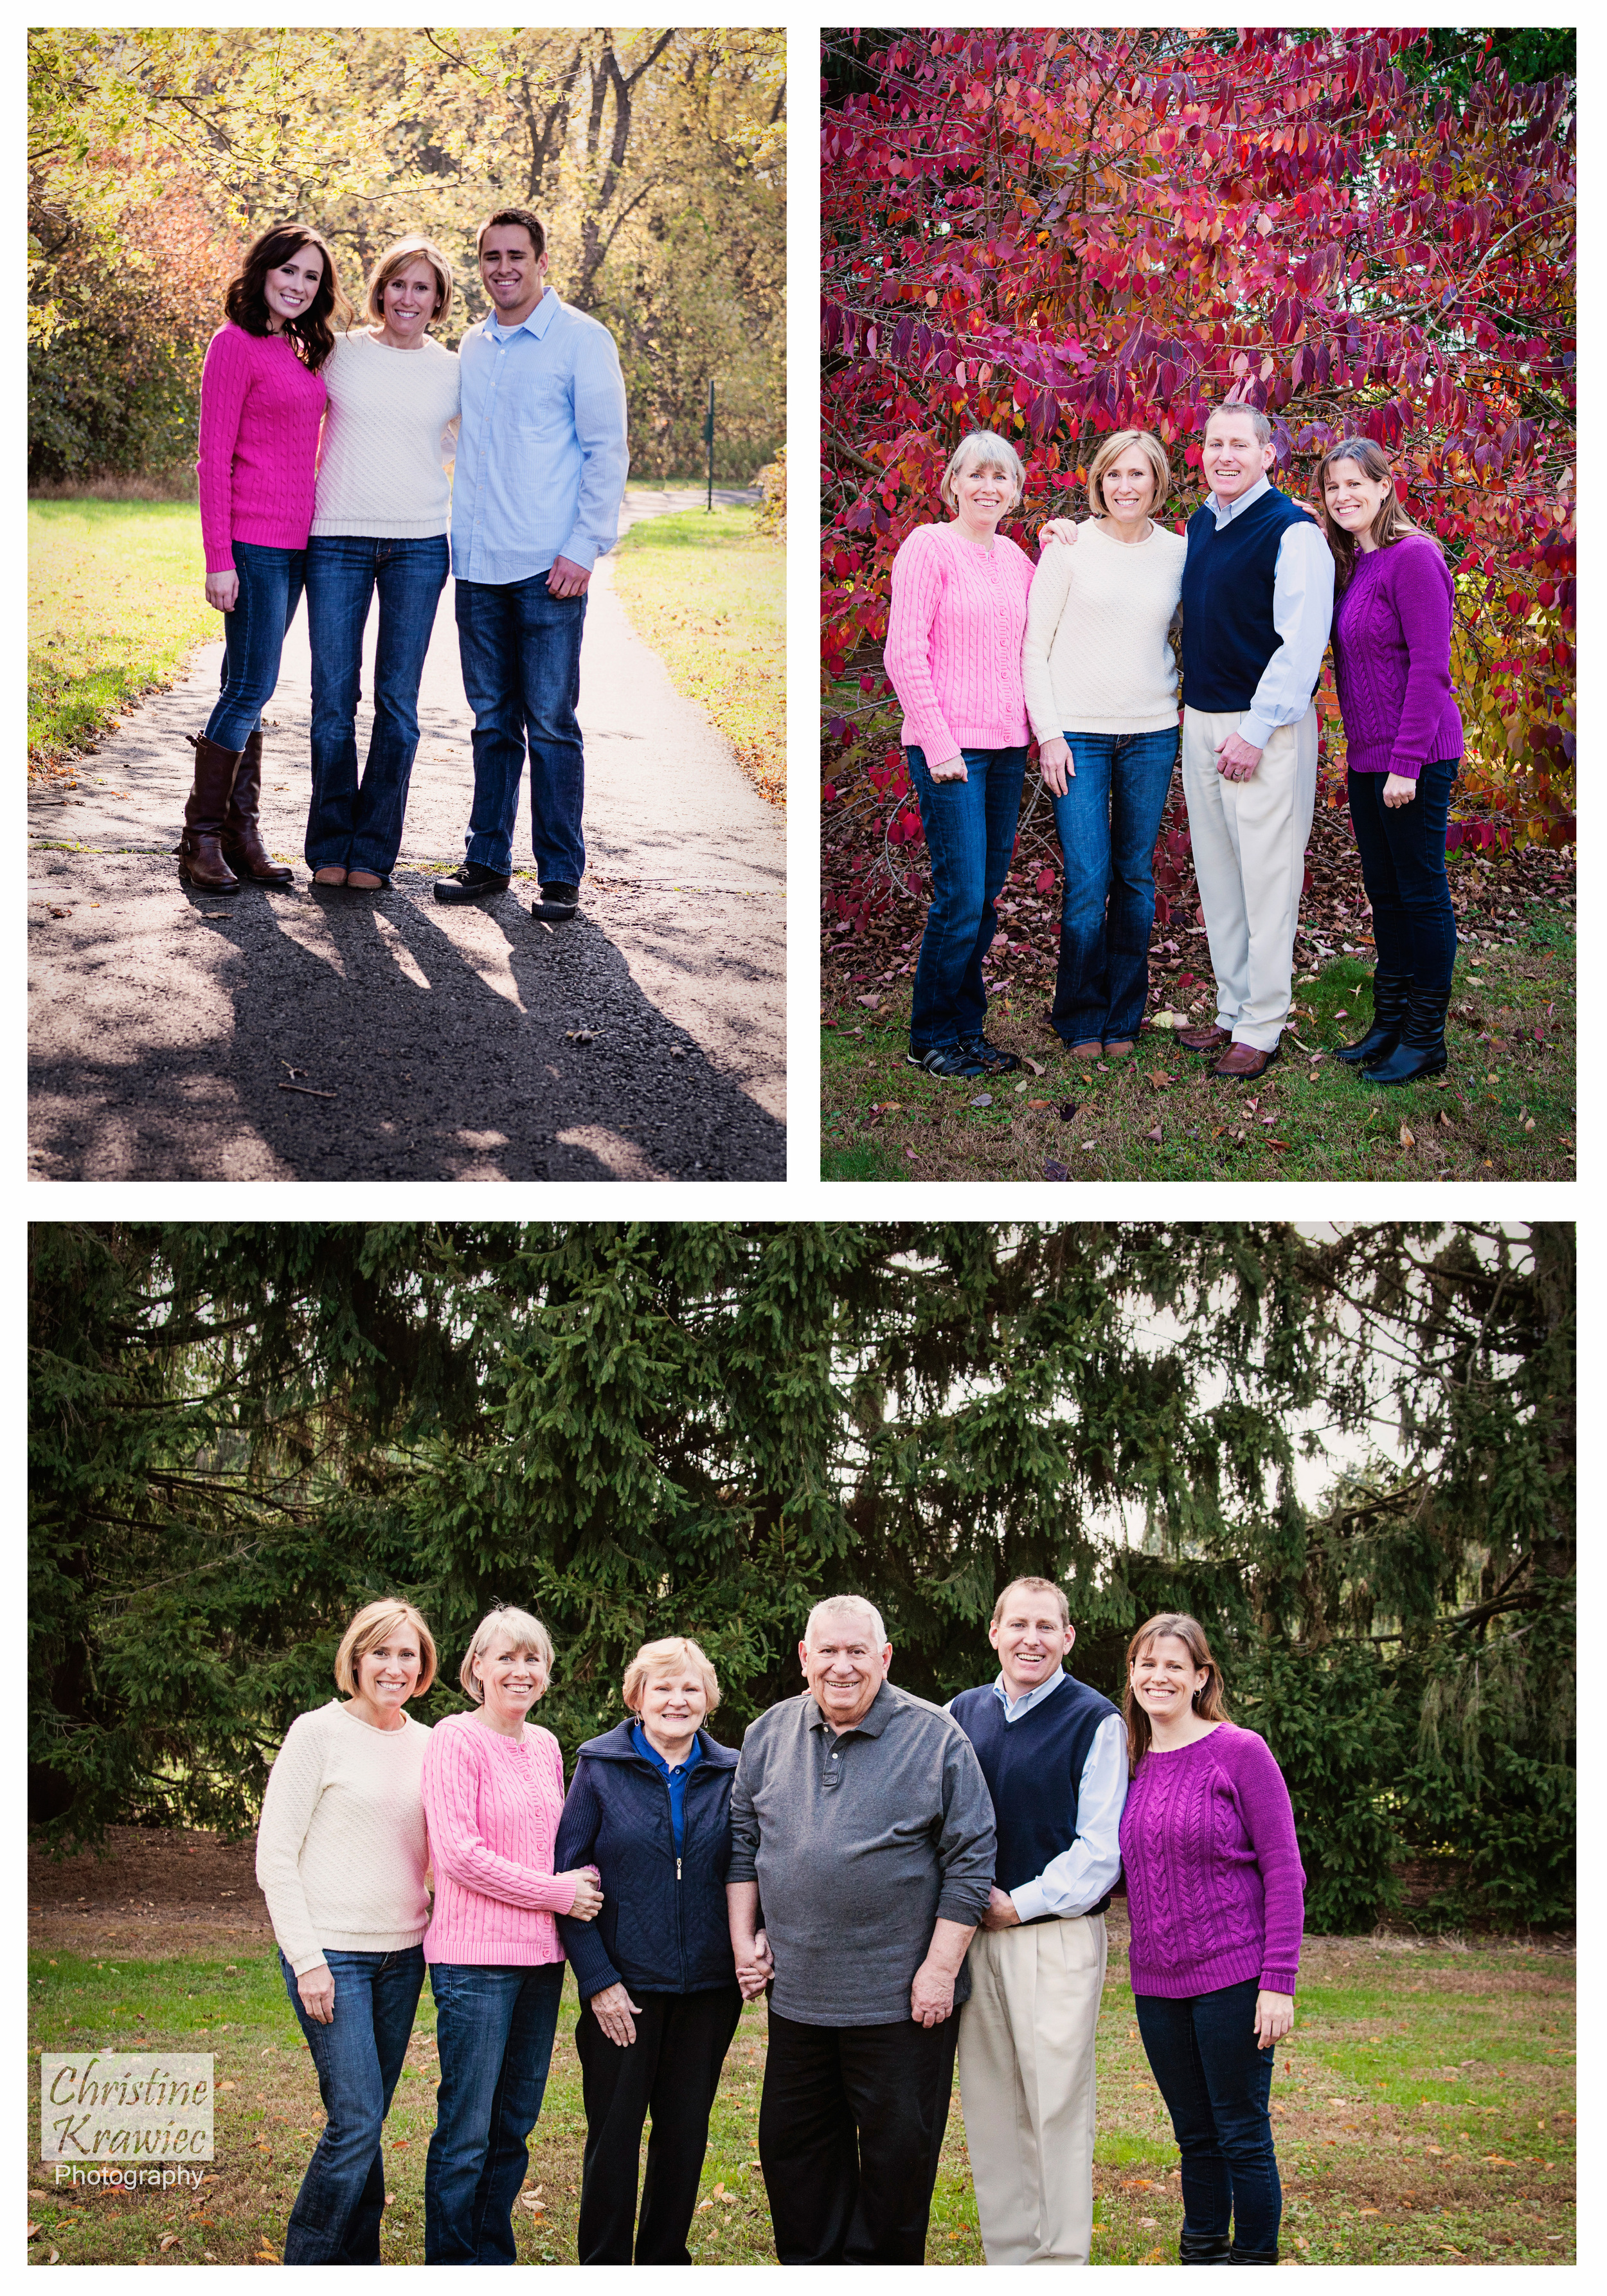 Christin Krawiec Photography - Bucks County Family Photographer